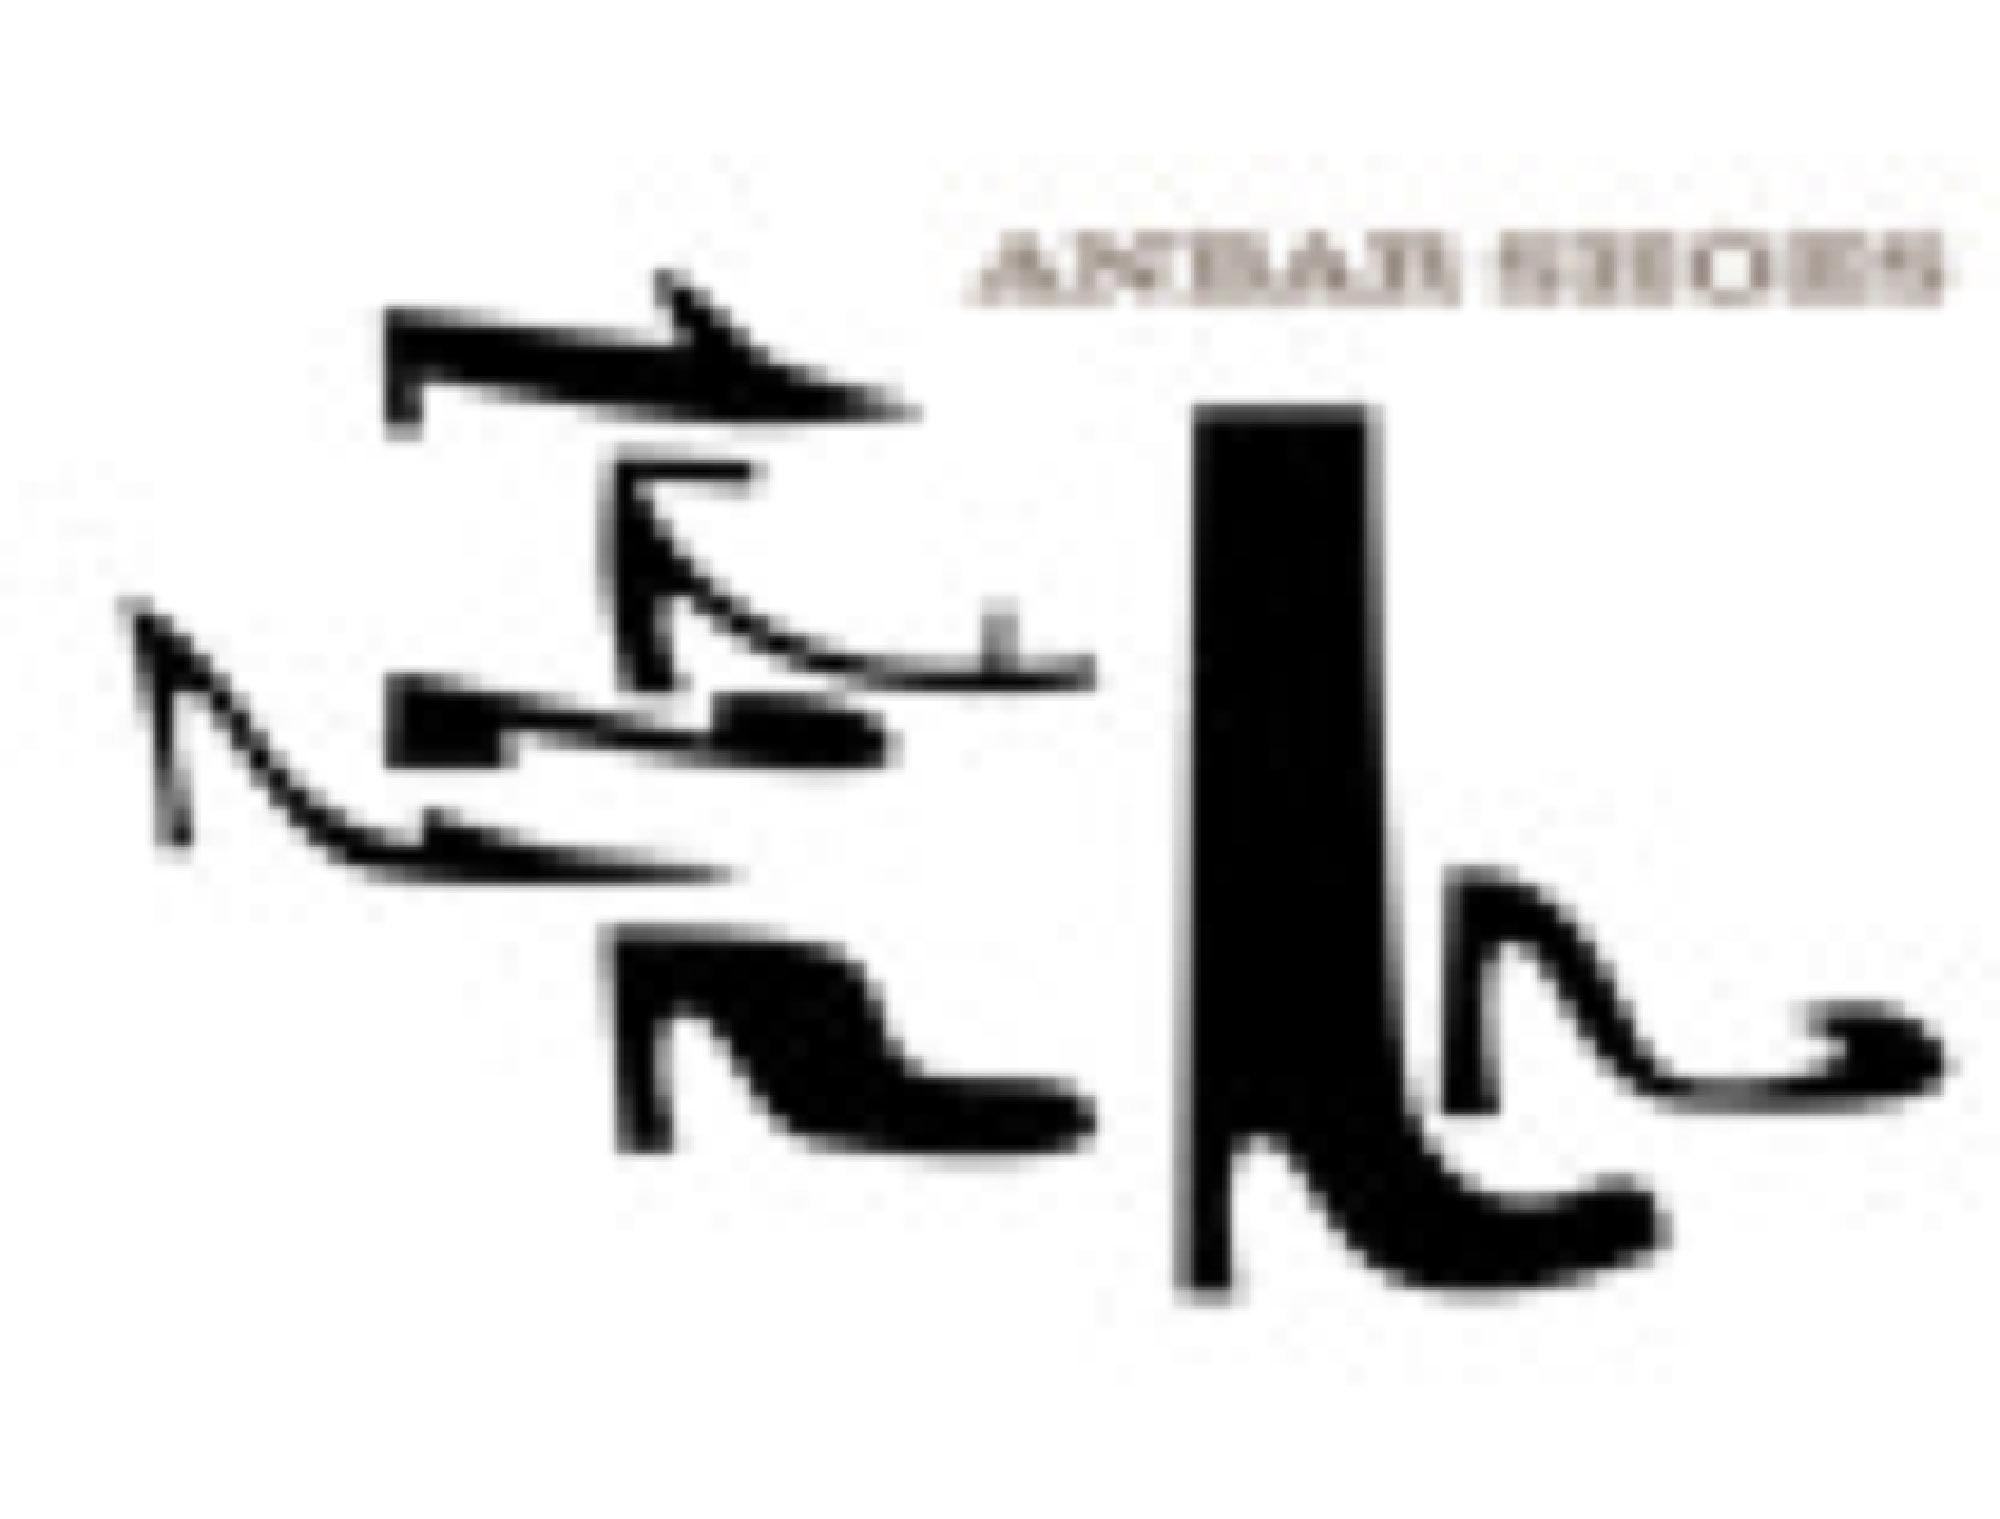 ANBAR Shoes Advertisement